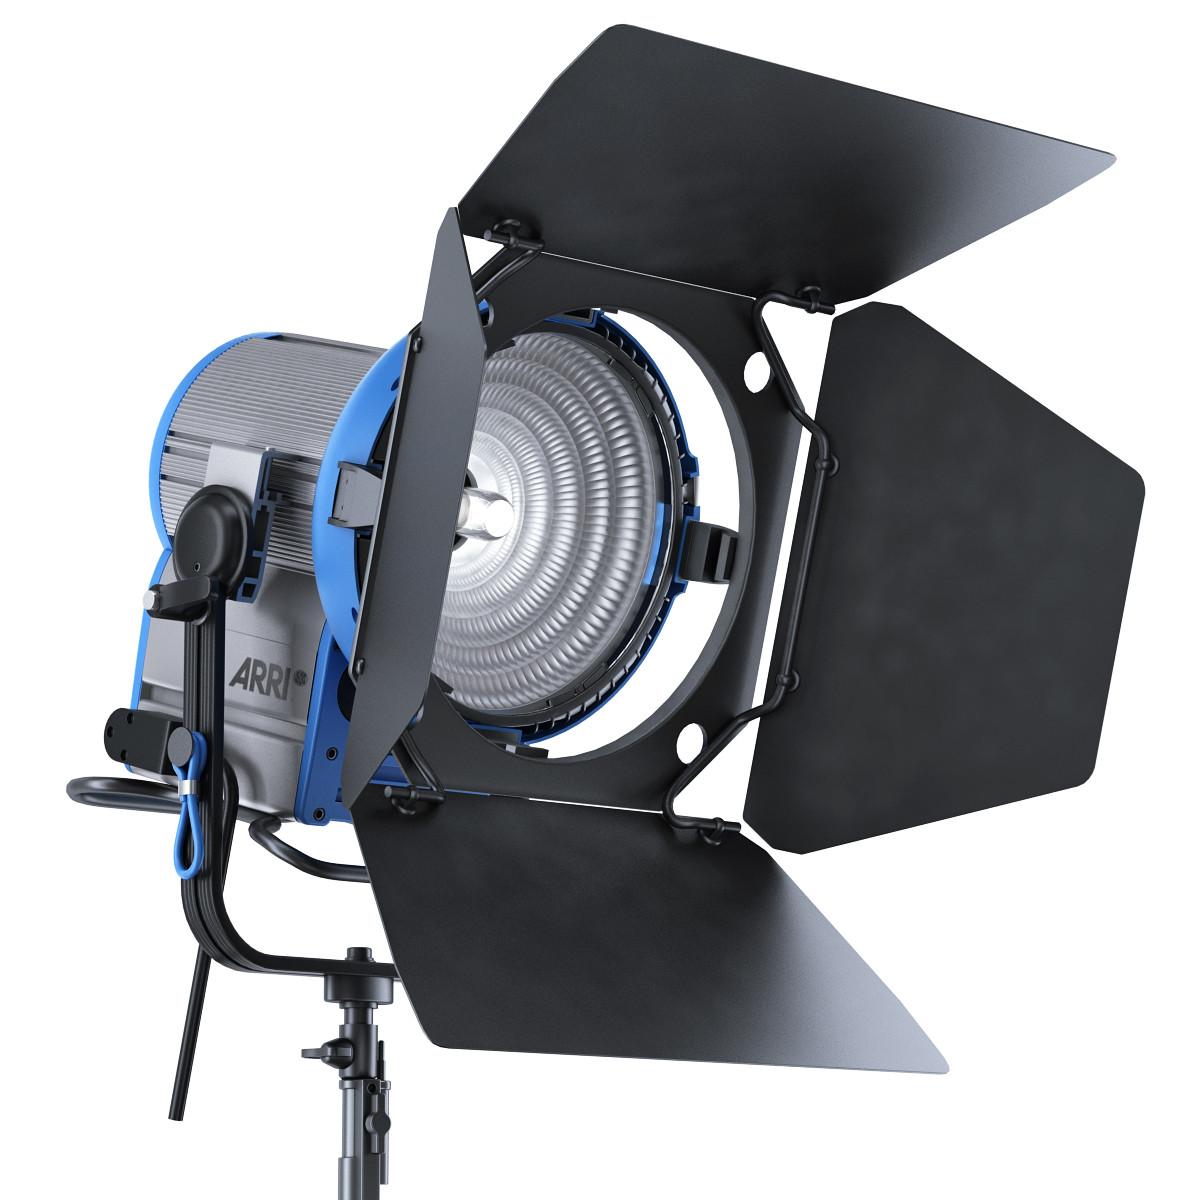 Arri M18 Greenkit Film Lighting Hire